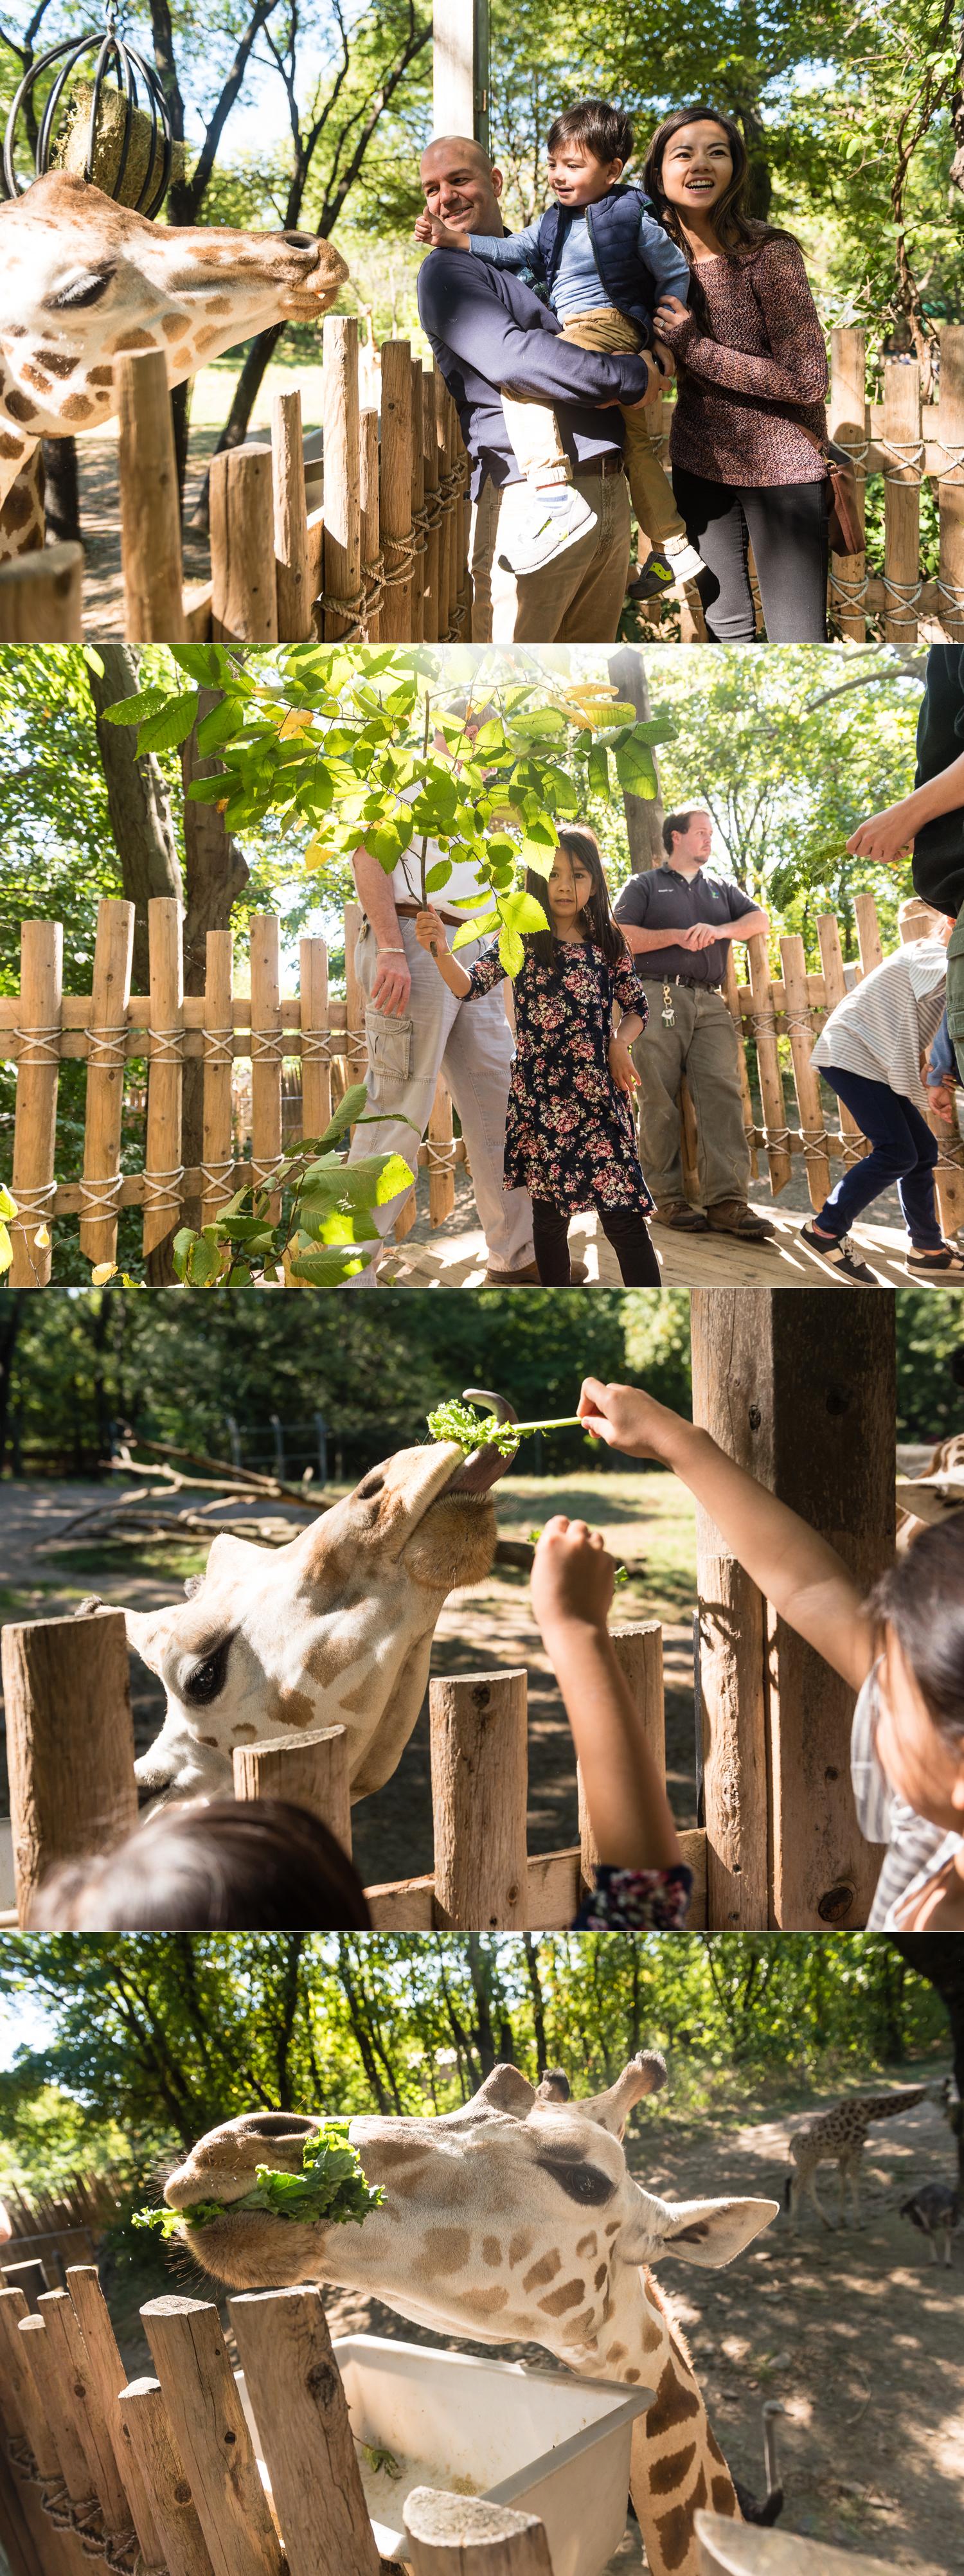 amy-drucker-new-york-city-zoo-day-5.jpg